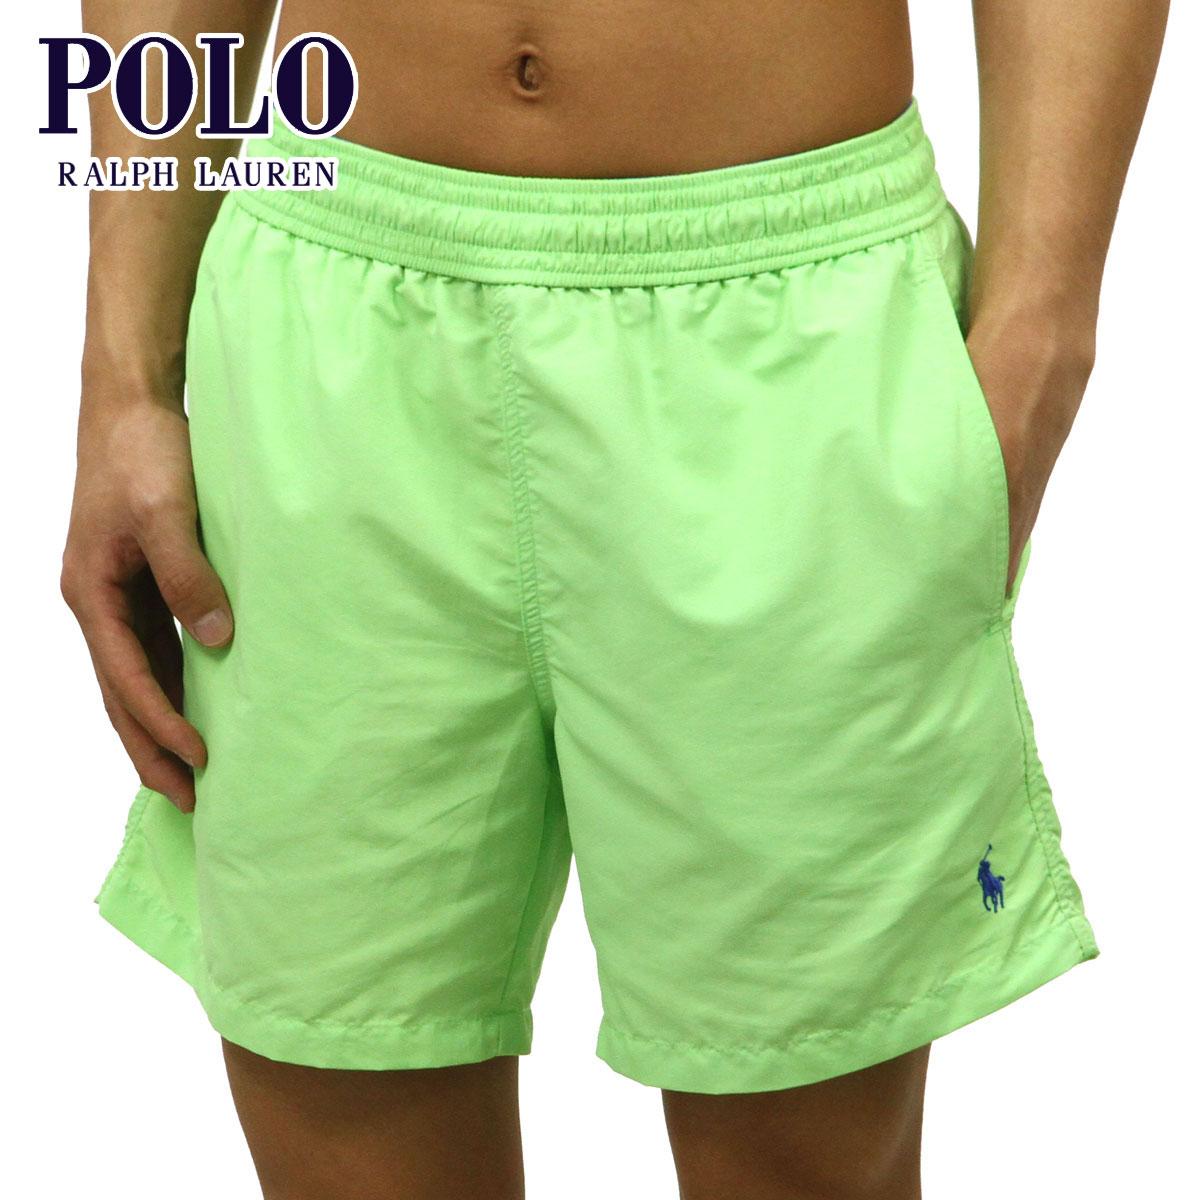 9420ca67 Polo Ralph Lauren POLO RALPH LAUREN regular article men swimming underwear  POLO SWIM TRUNK